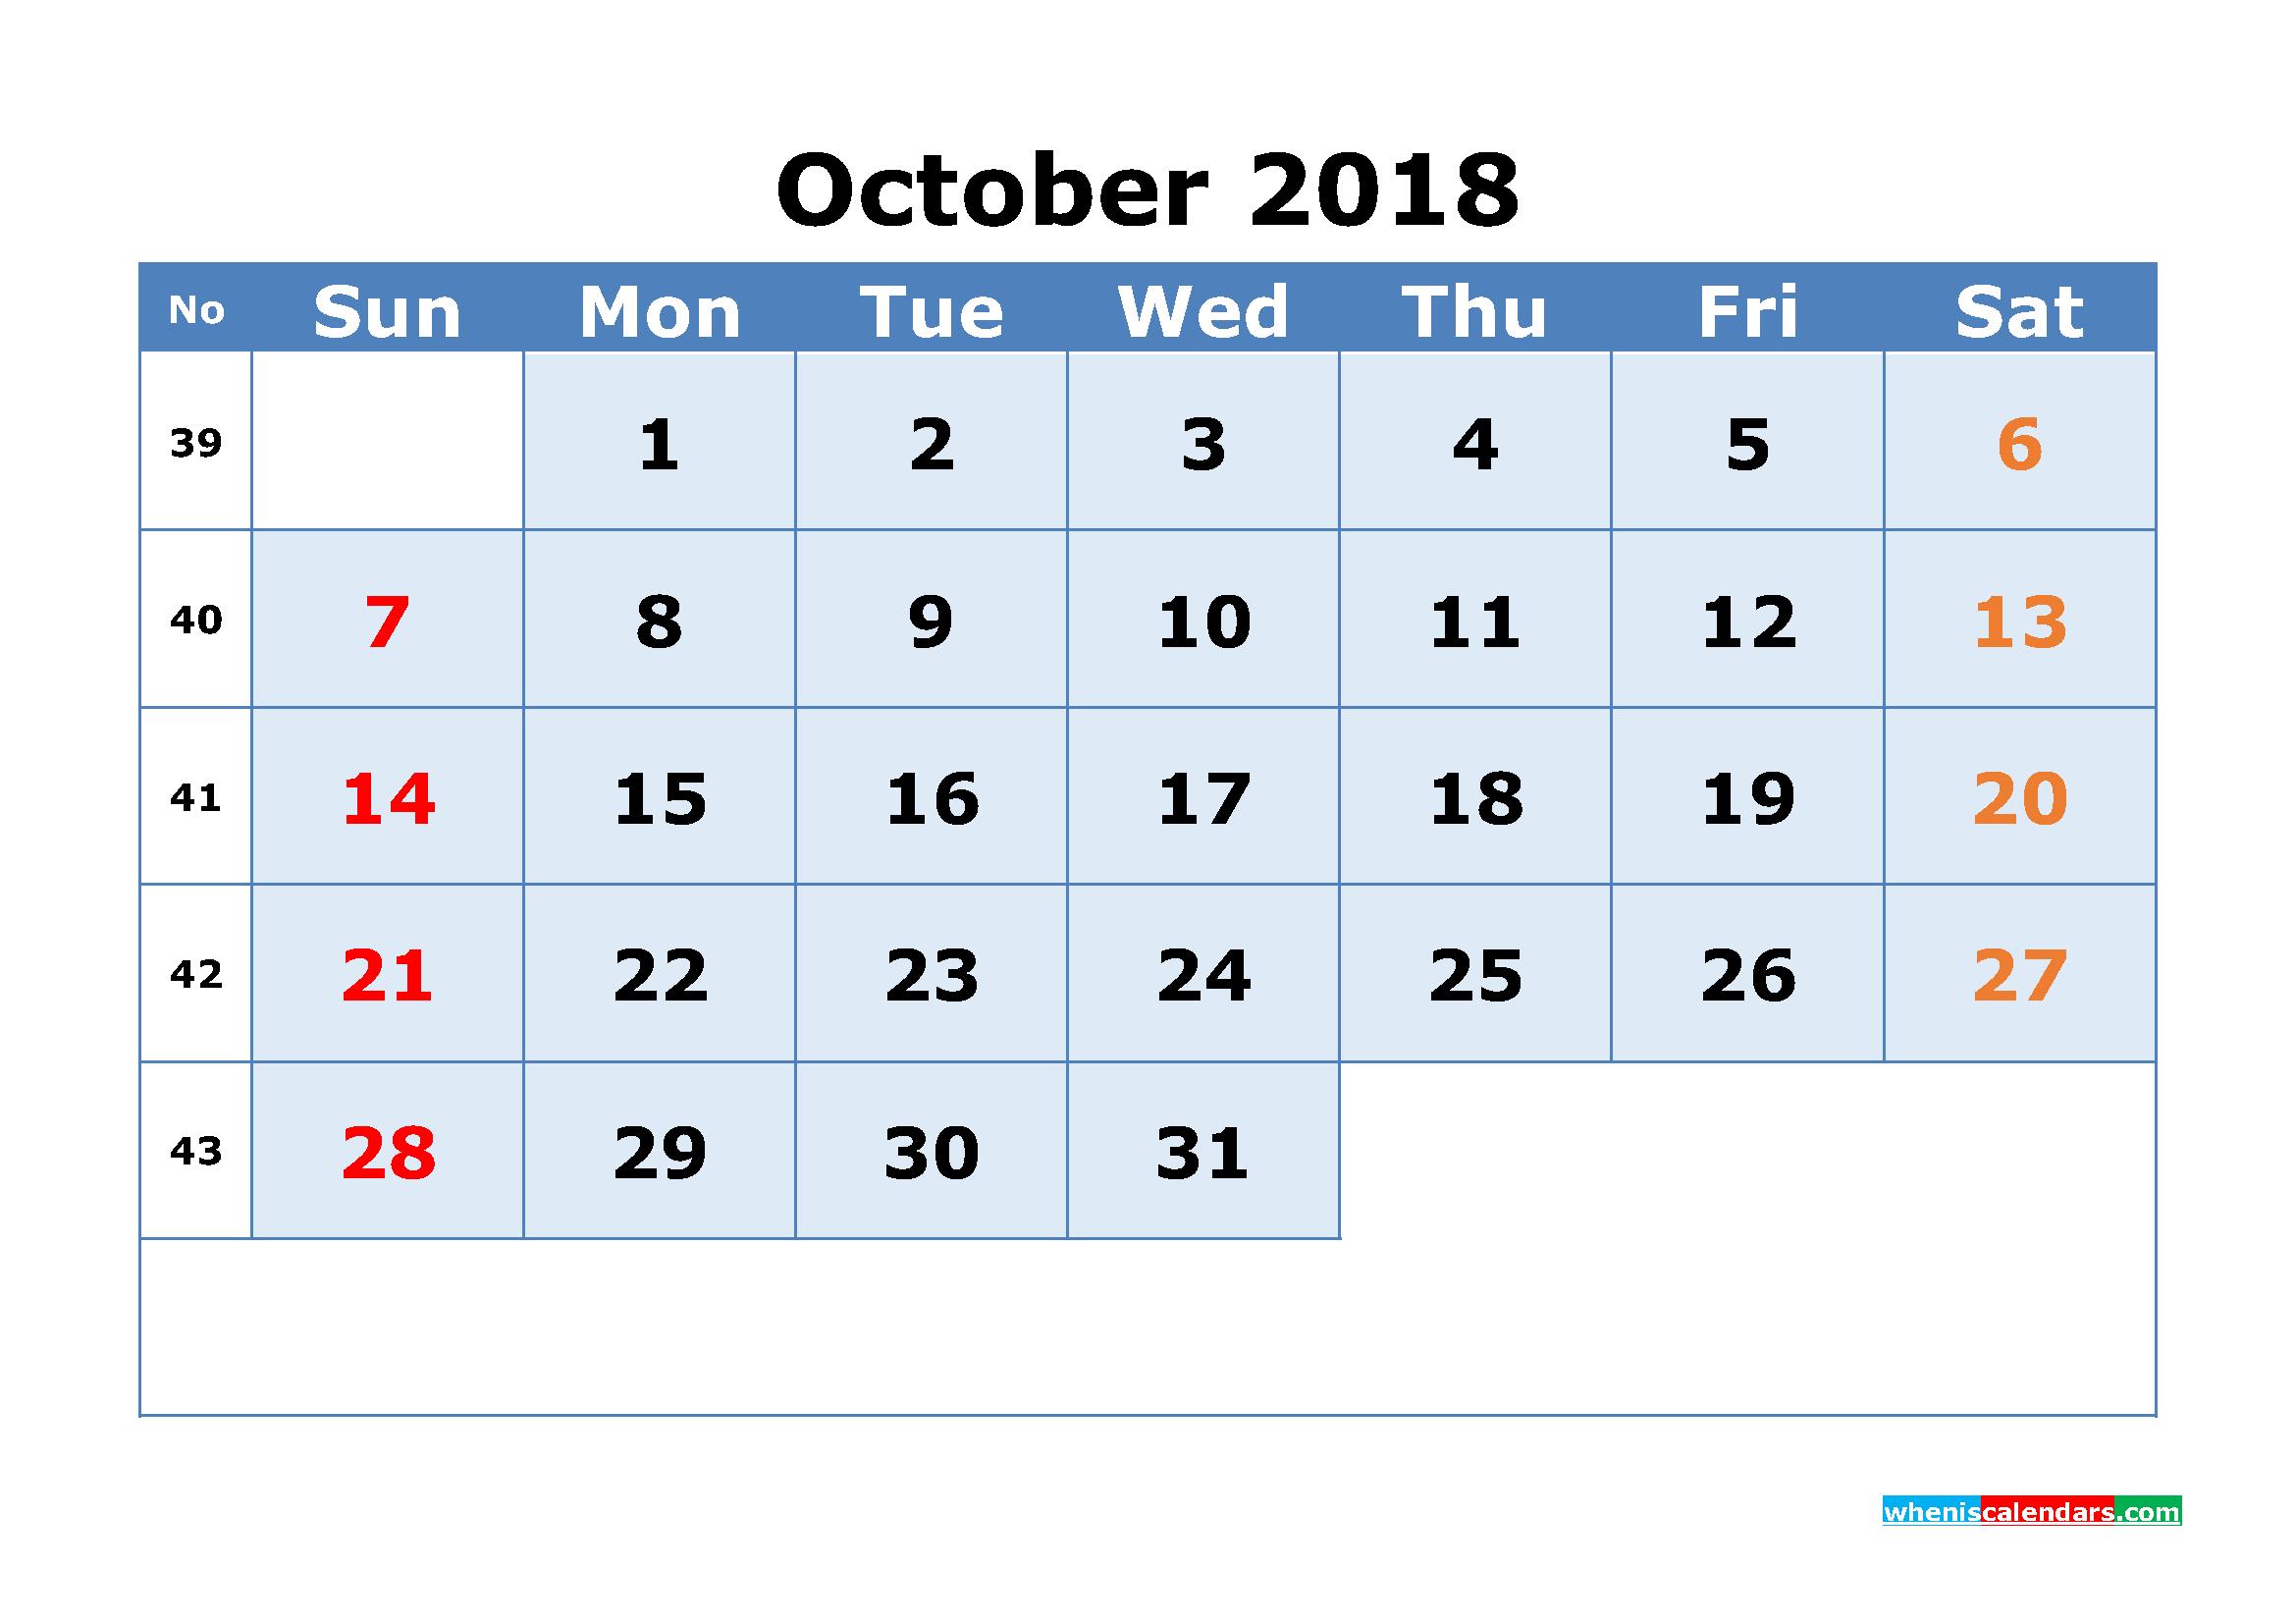 October 2018 Calendar With Week Numbers Printable 1 Month